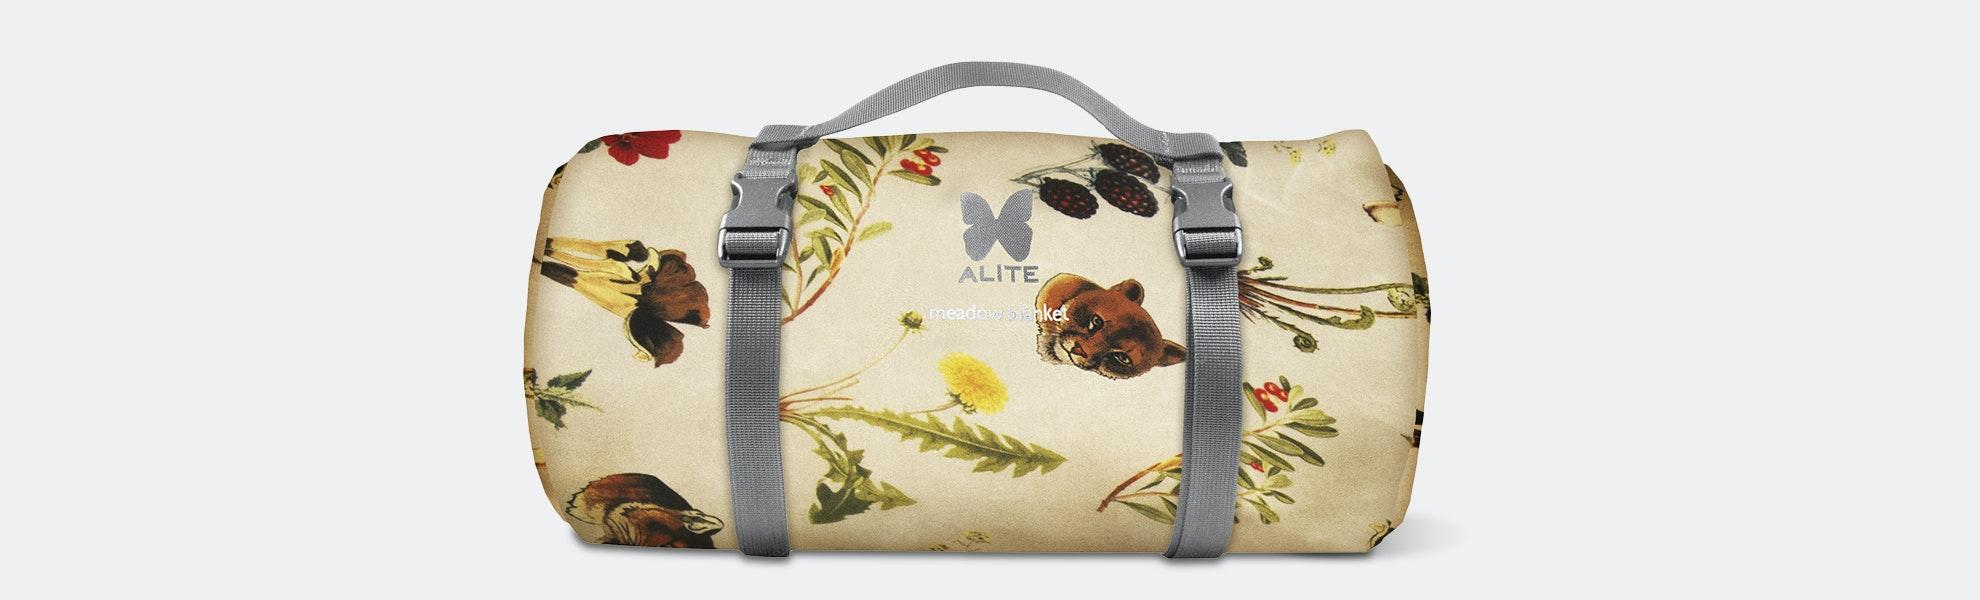 Alite Fleece Meadow Blanket